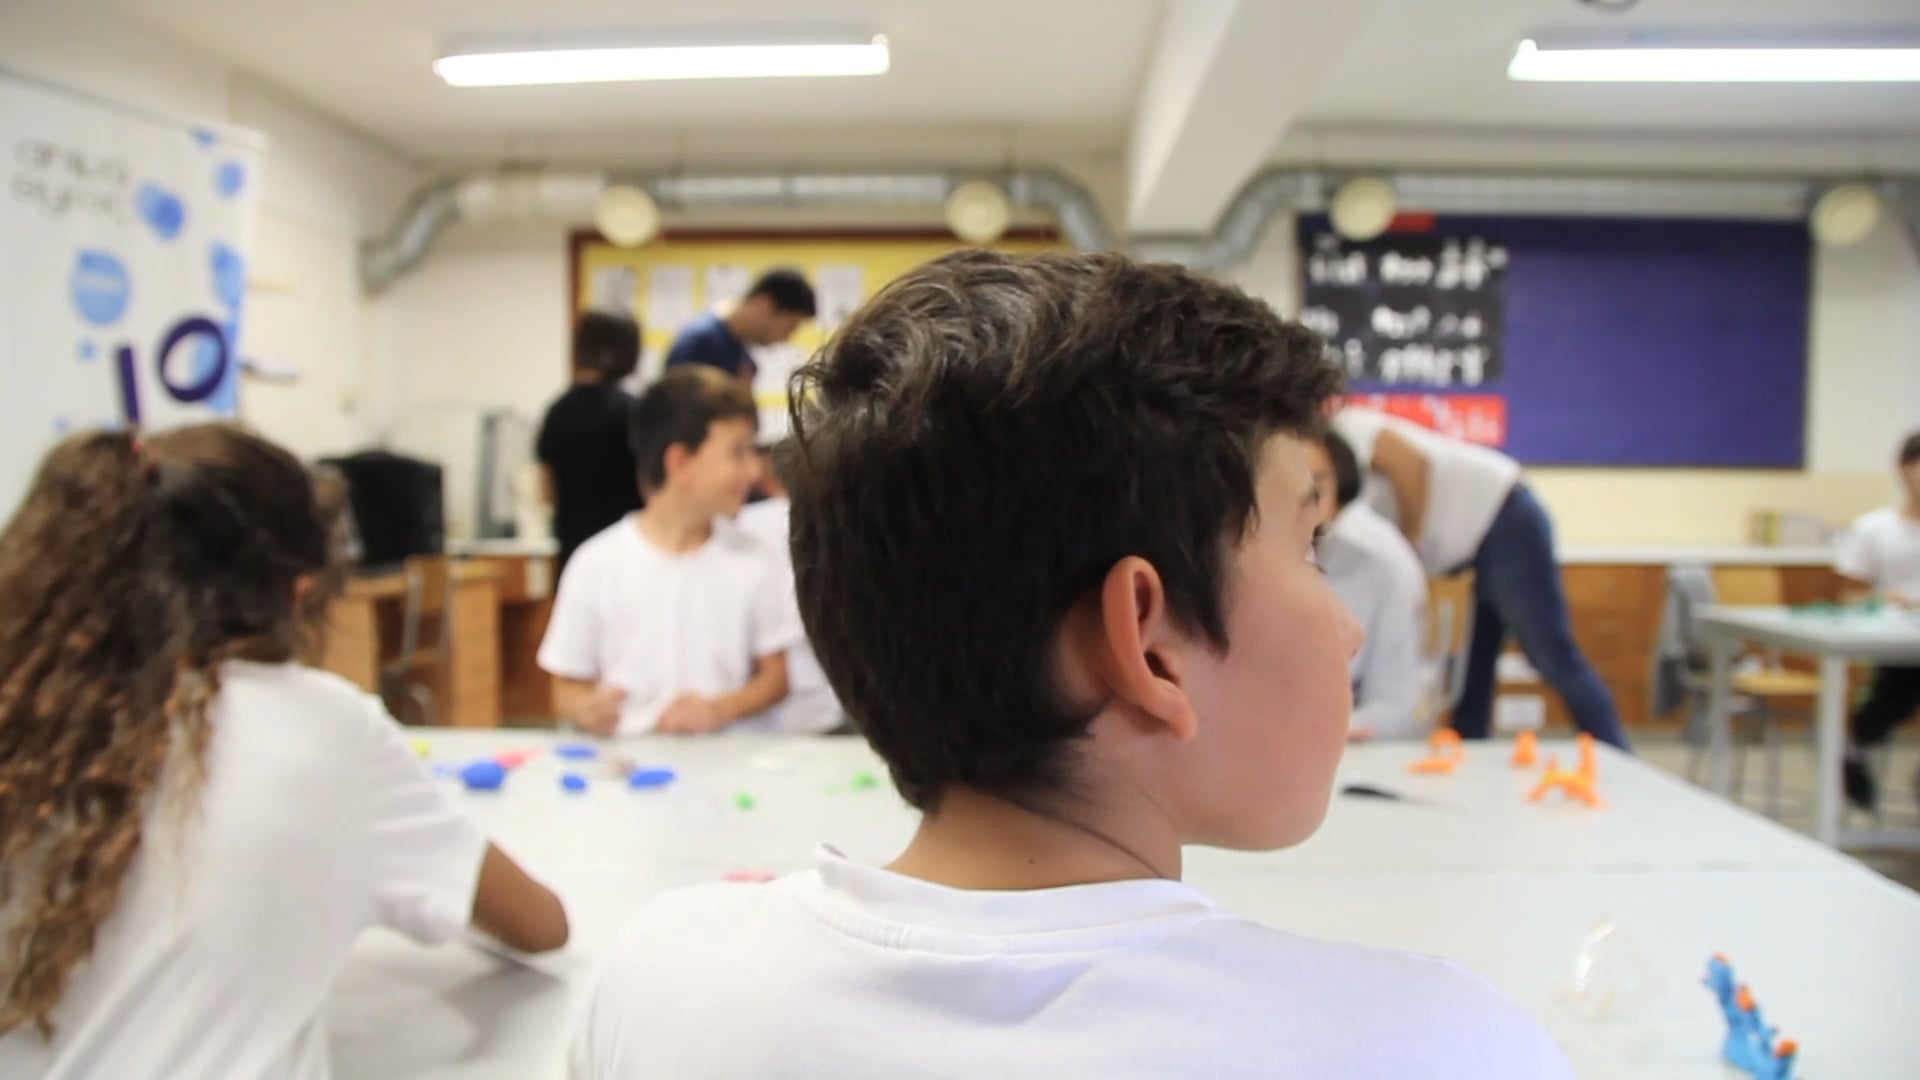 The Animattikon Project / Εργαστήρι animation με θέμα την ανοχή στη διαφορετικότητα